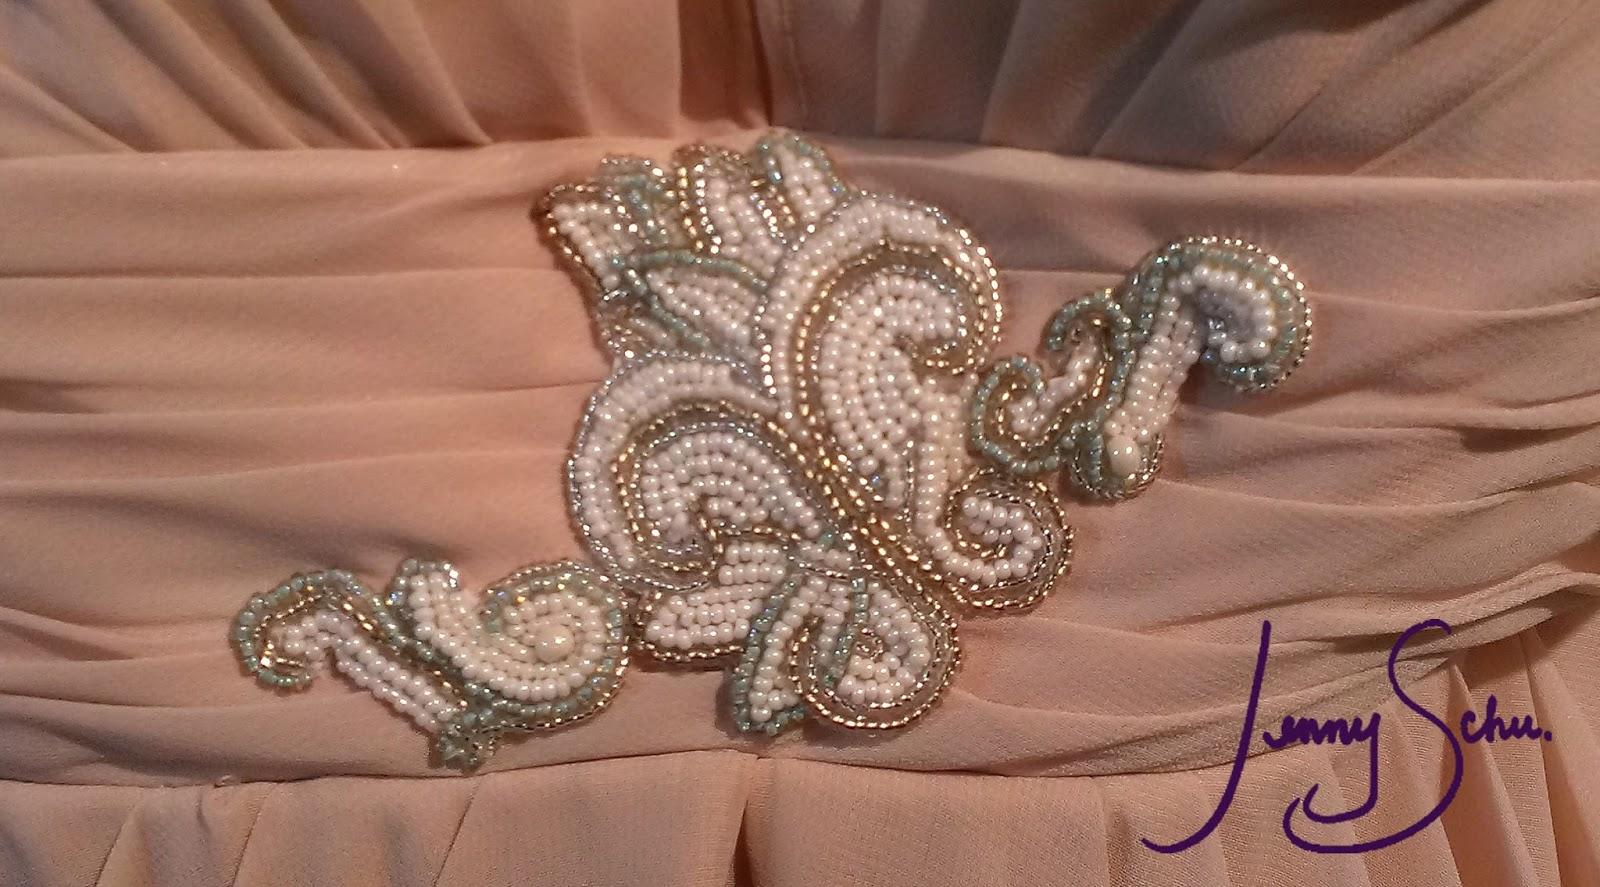 Jenny schu beadweaving and fiber art wedding dress bead